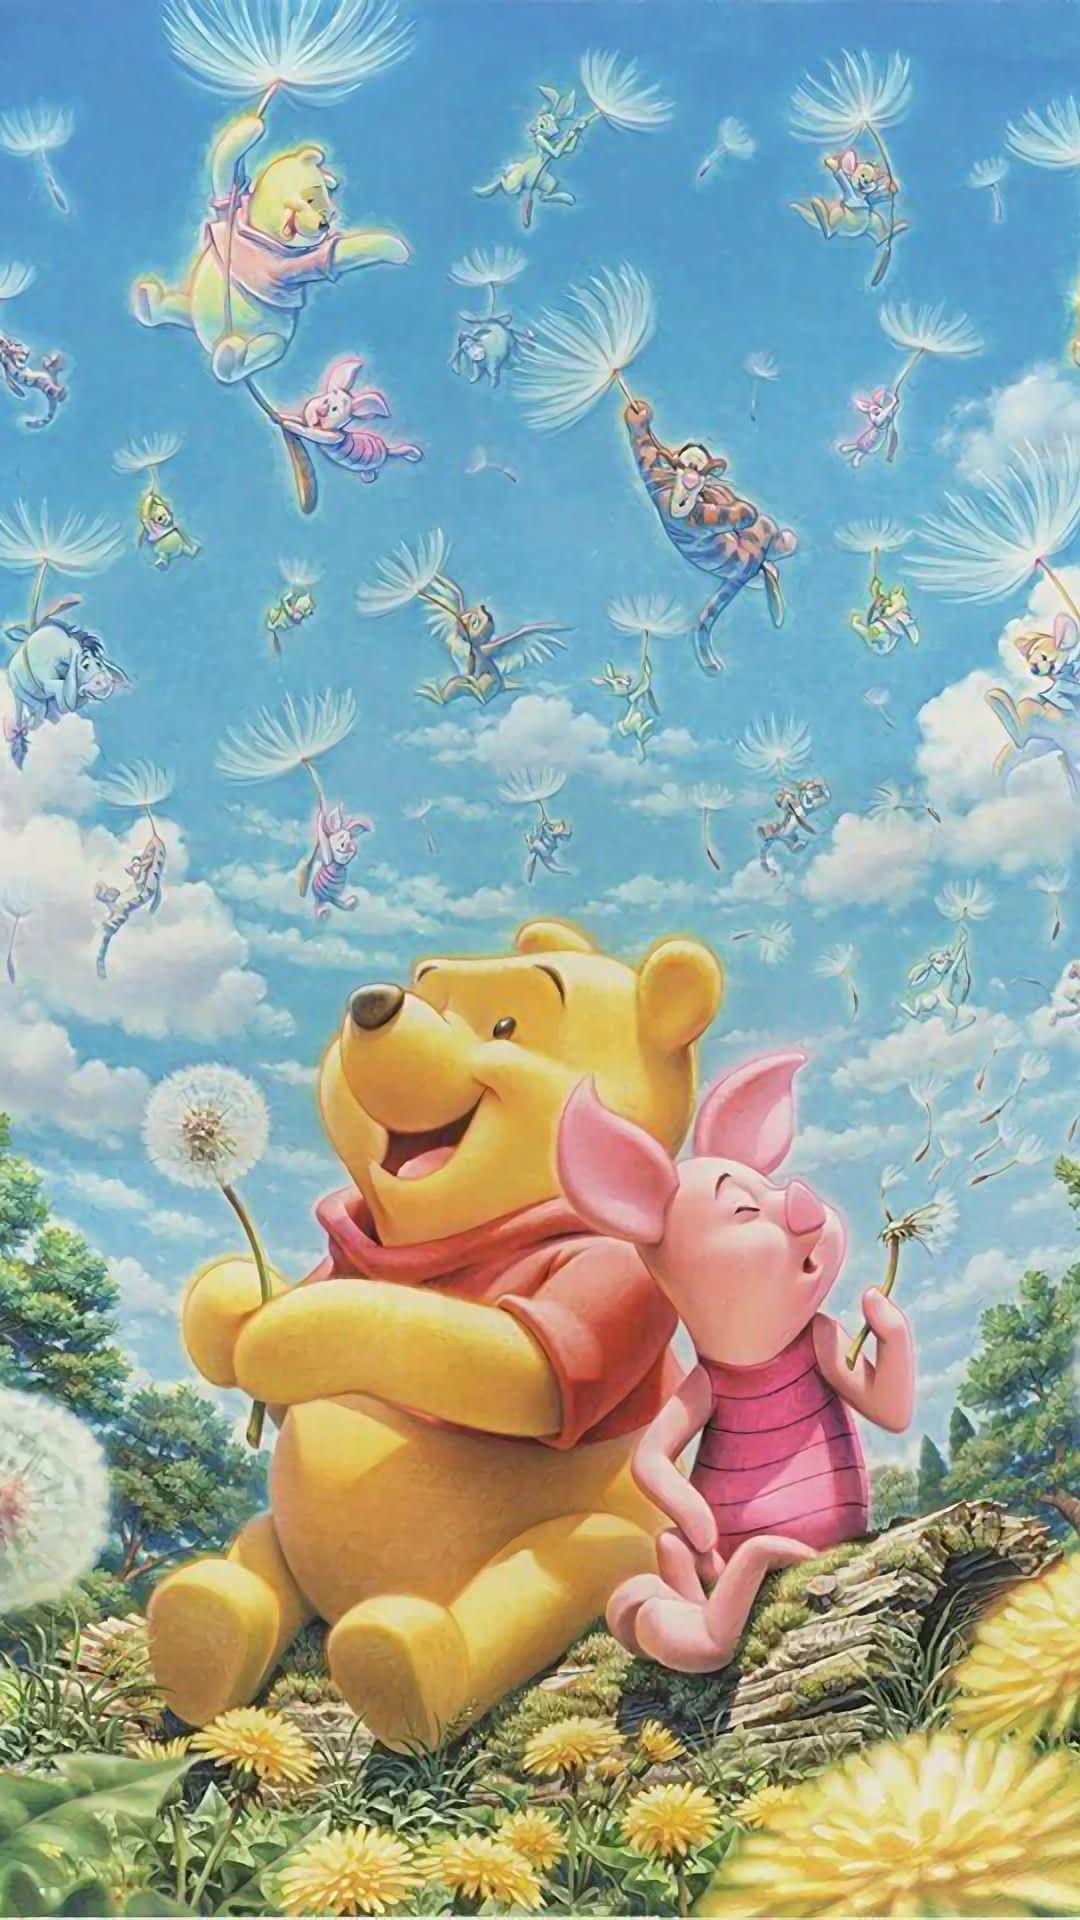 New Iphone Wallpaper Iphone Wallpaper Winnie The Pooh Cartoon Cute Winnie The Pooh Winnie The Pooh Pictures